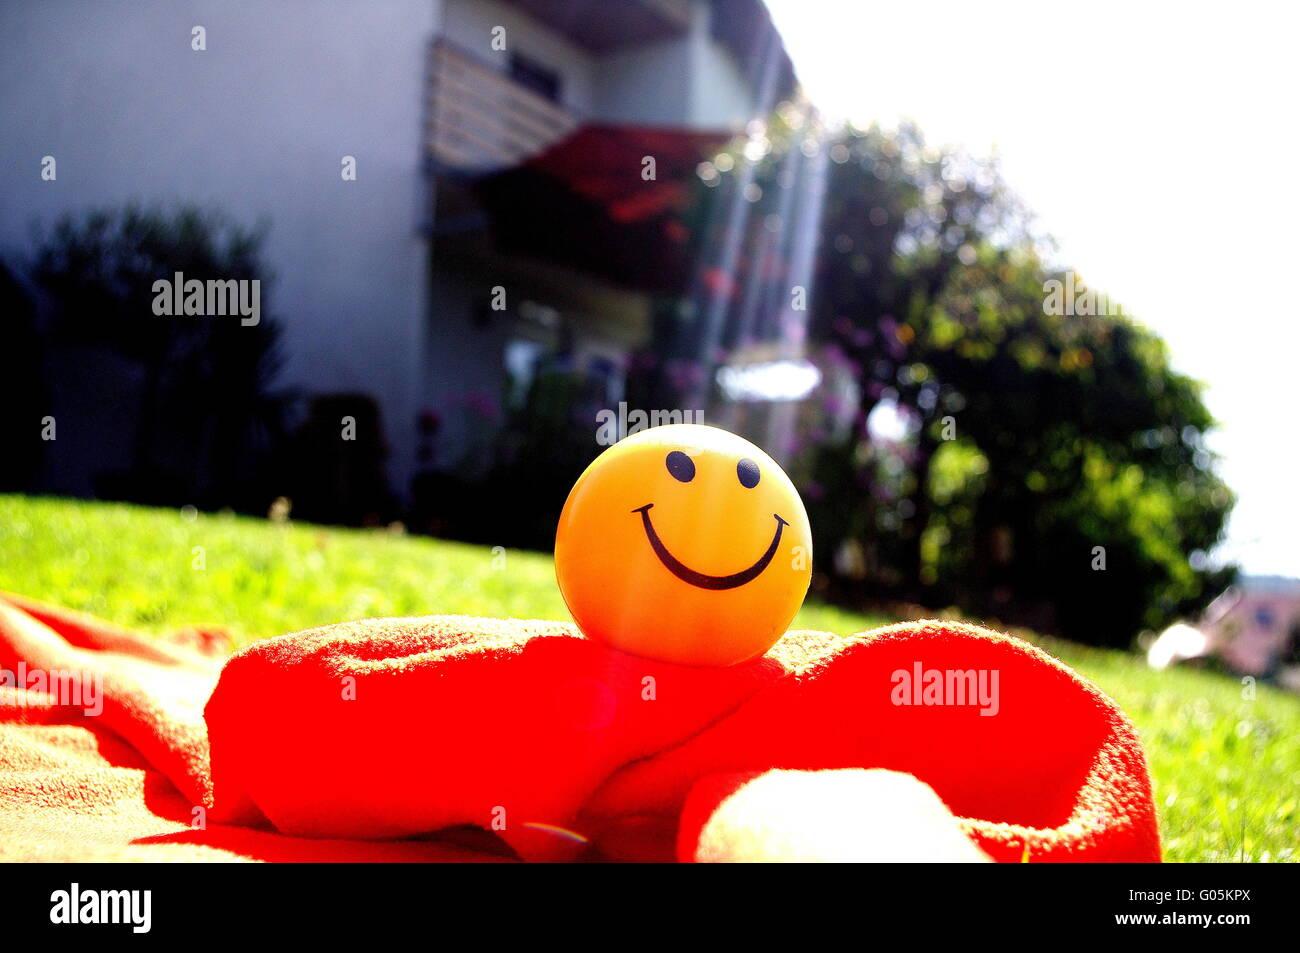 Let the sun shine - Stock Image